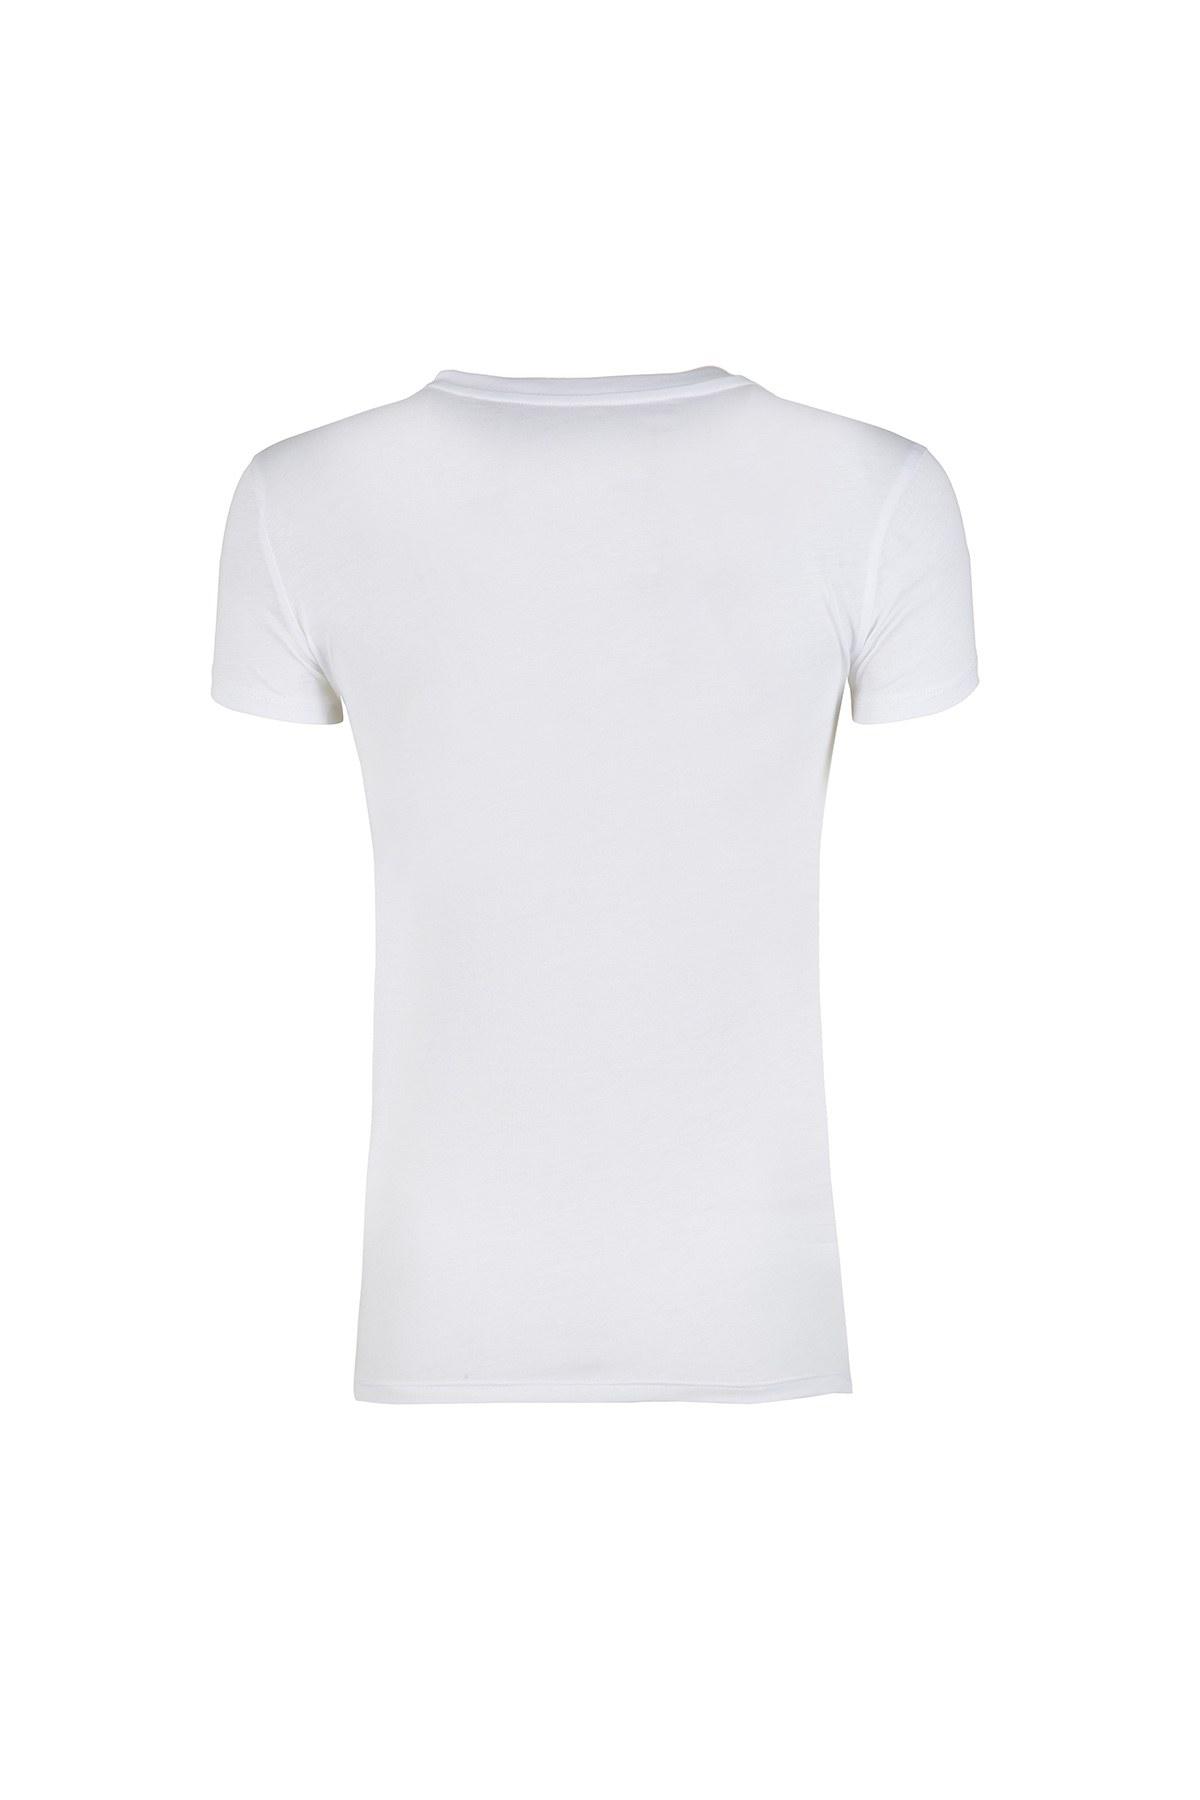 ARMANI EXCHANGE T SHIRT Bayan T Shirt 3ZYTAP YJA8Z 1100 BEYAZ